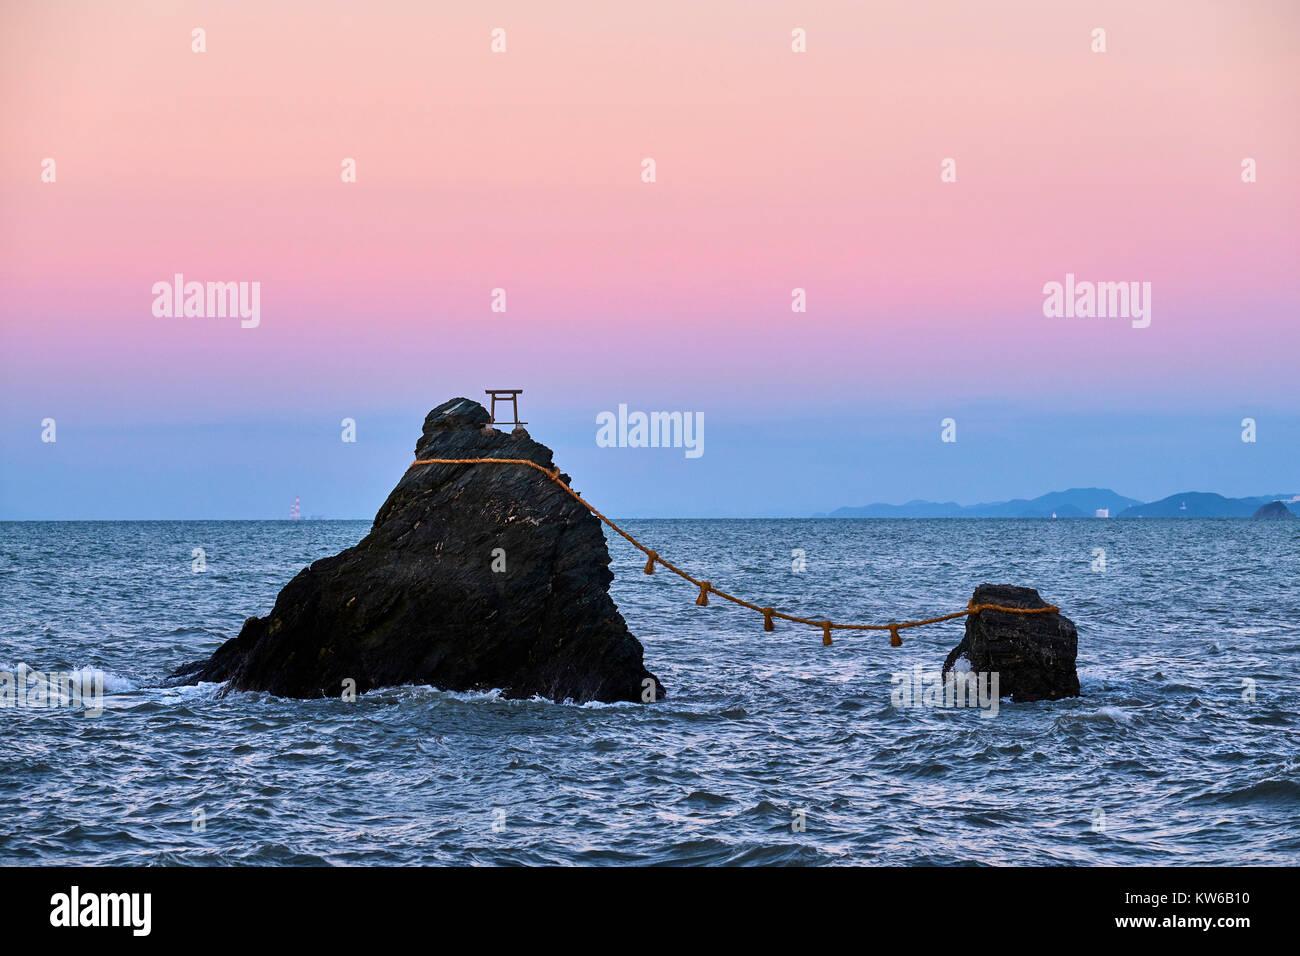 Japan, Honshu island, Ise Shima, Mie region, Futami, Meoto-Iwa (Wedded Rocks), two rocks considered to be male and - Stock Image